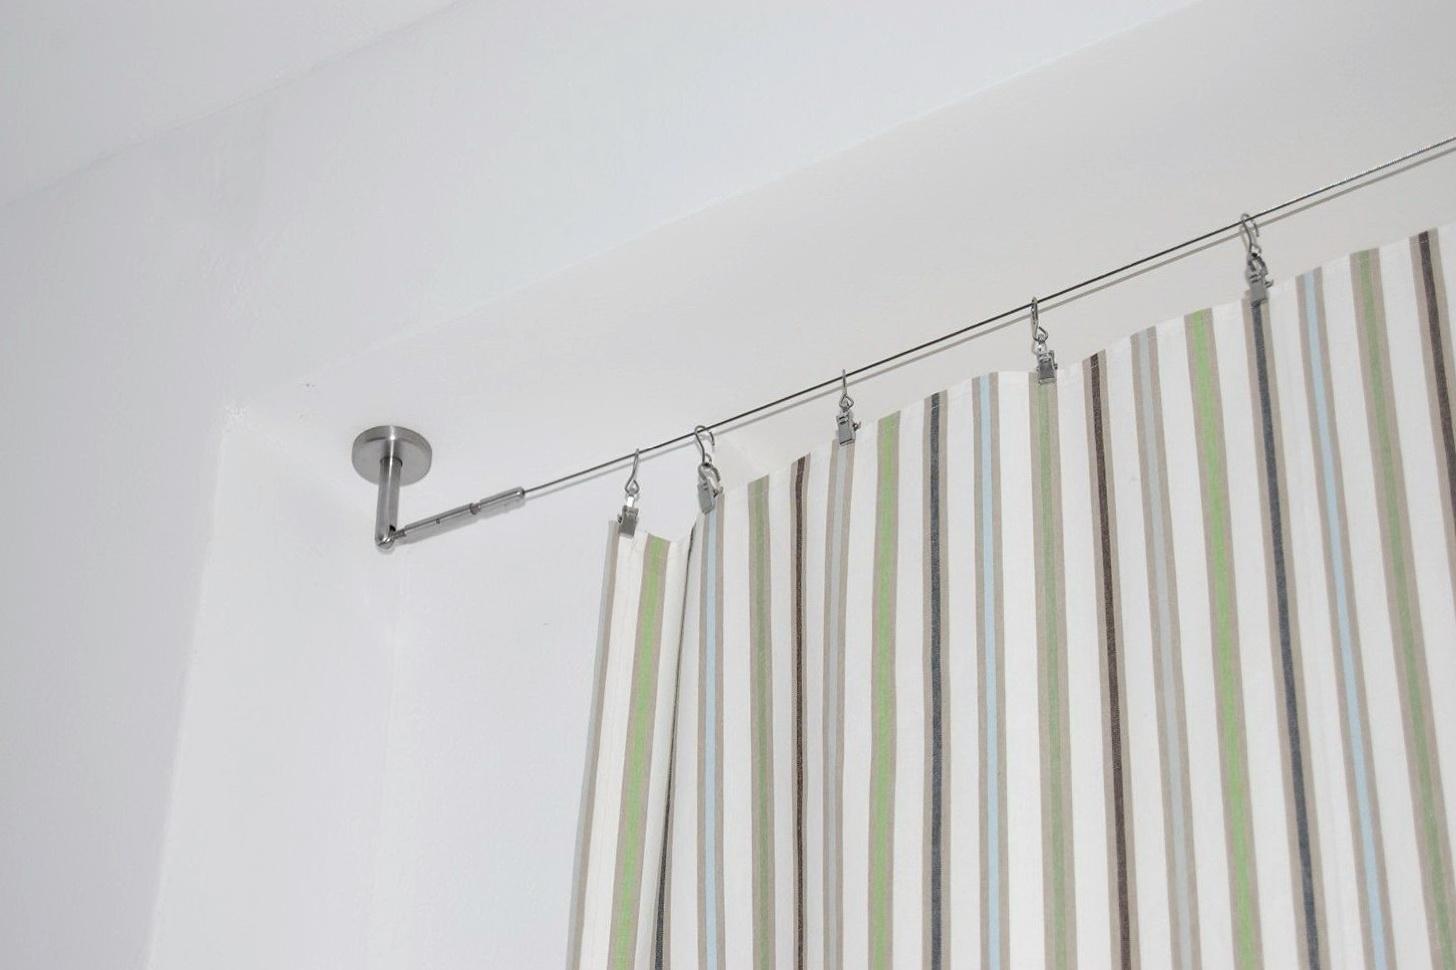 ikea curtain rods wire home design ideas. Black Bedroom Furniture Sets. Home Design Ideas